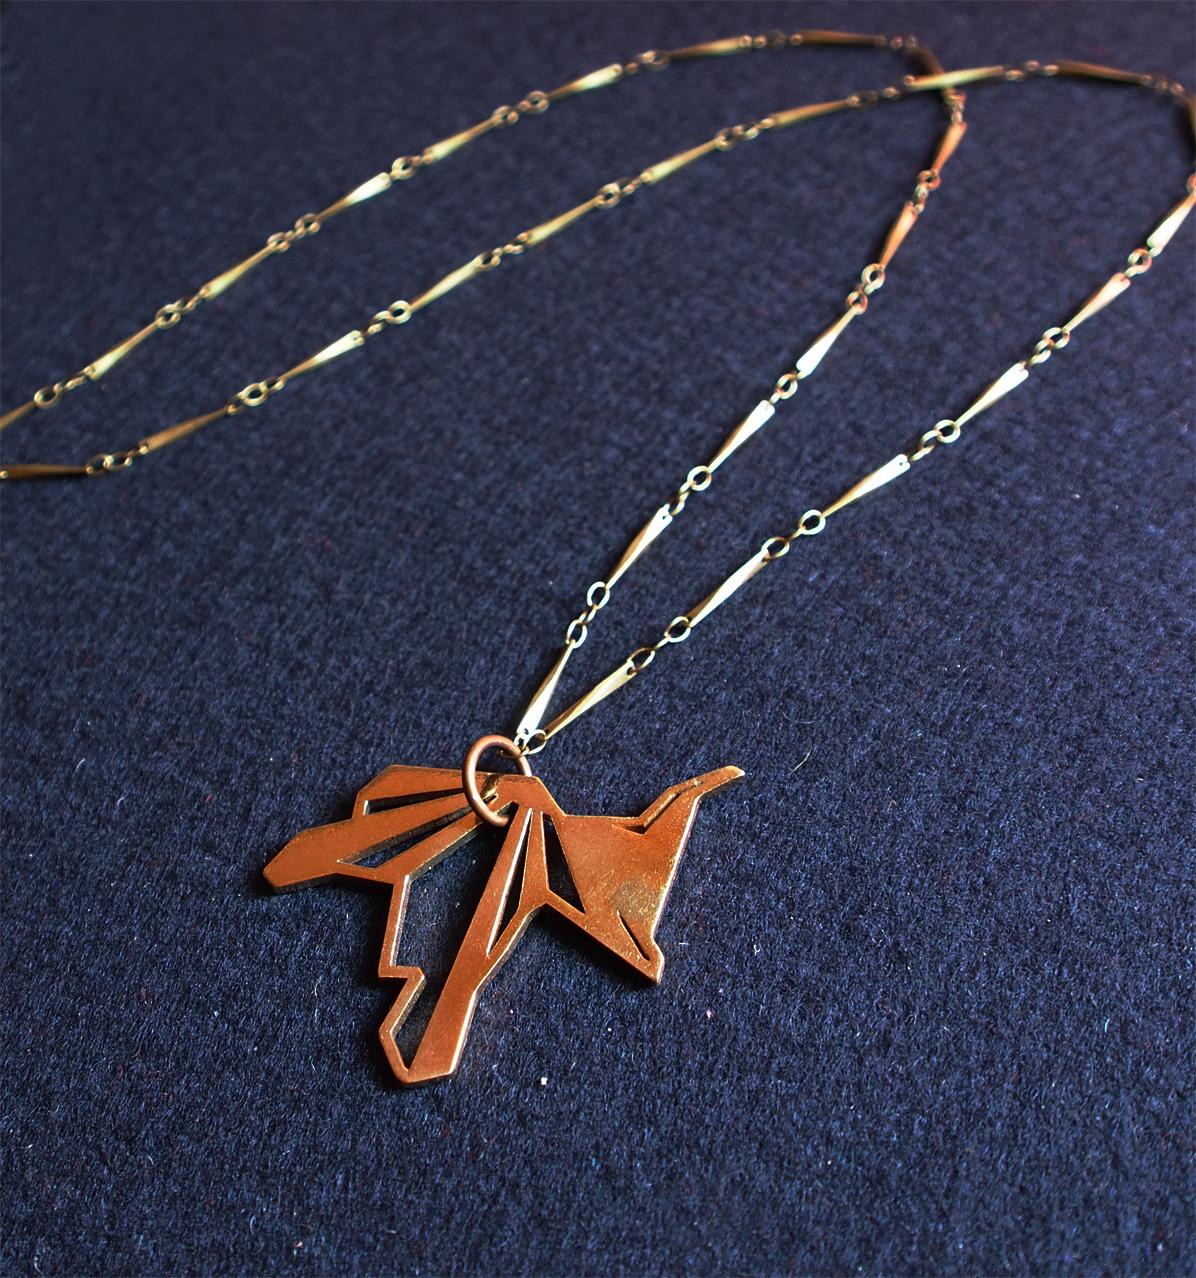 Fragmented_long neckleace 01_brass_detail_02_small.jpg